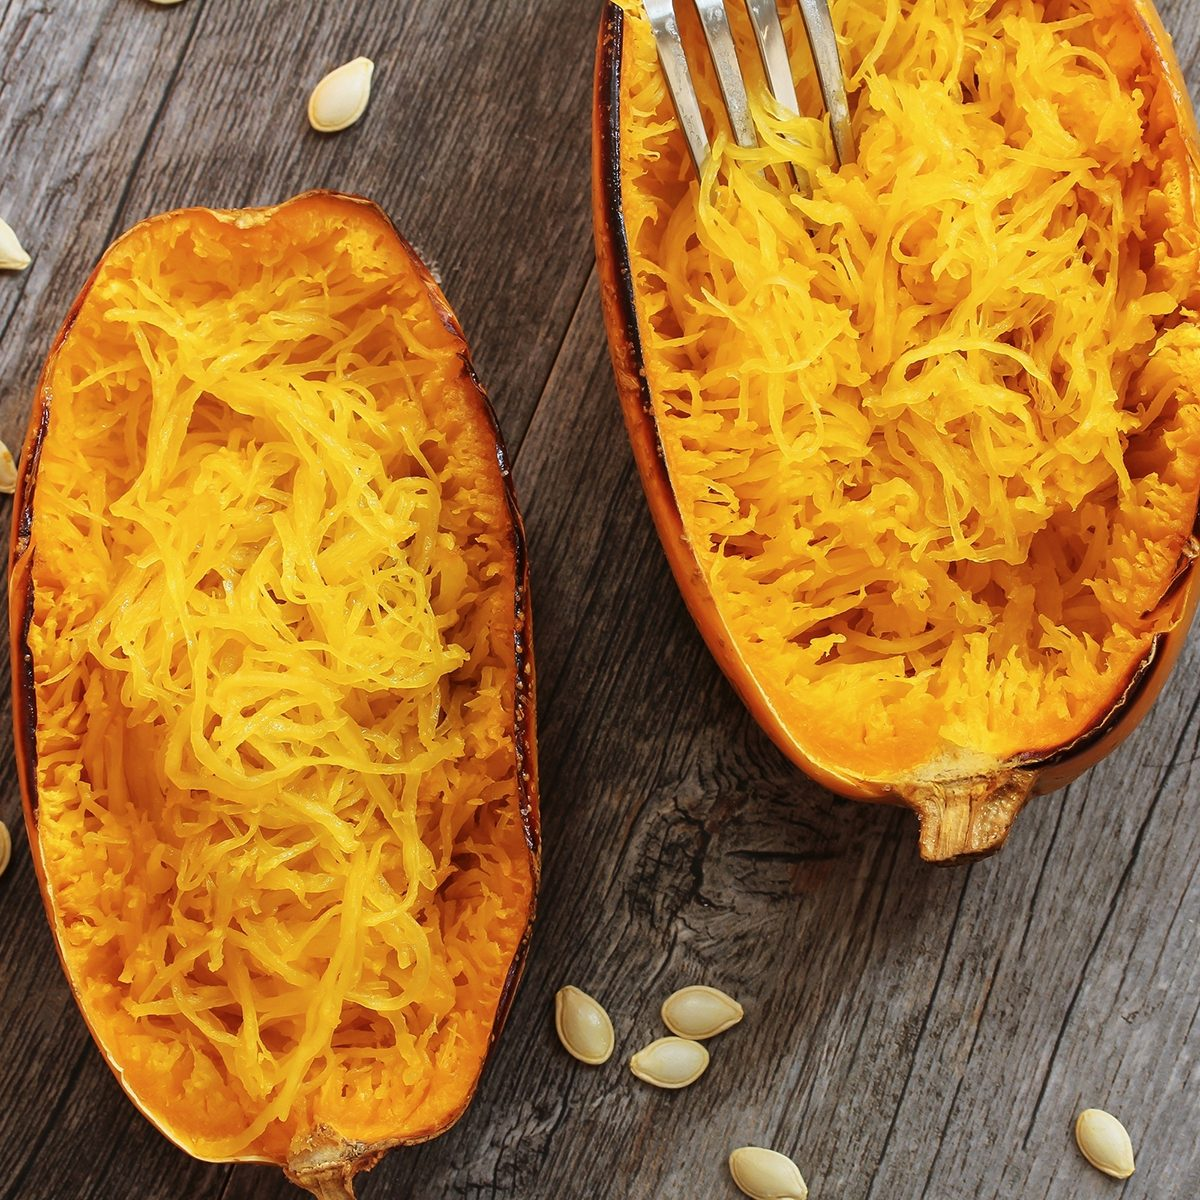 Spaghetti squash top down view; Shutterstock ID 496811113; Job (TFH, TOH, RD, BNB, CWM, CM): TOH